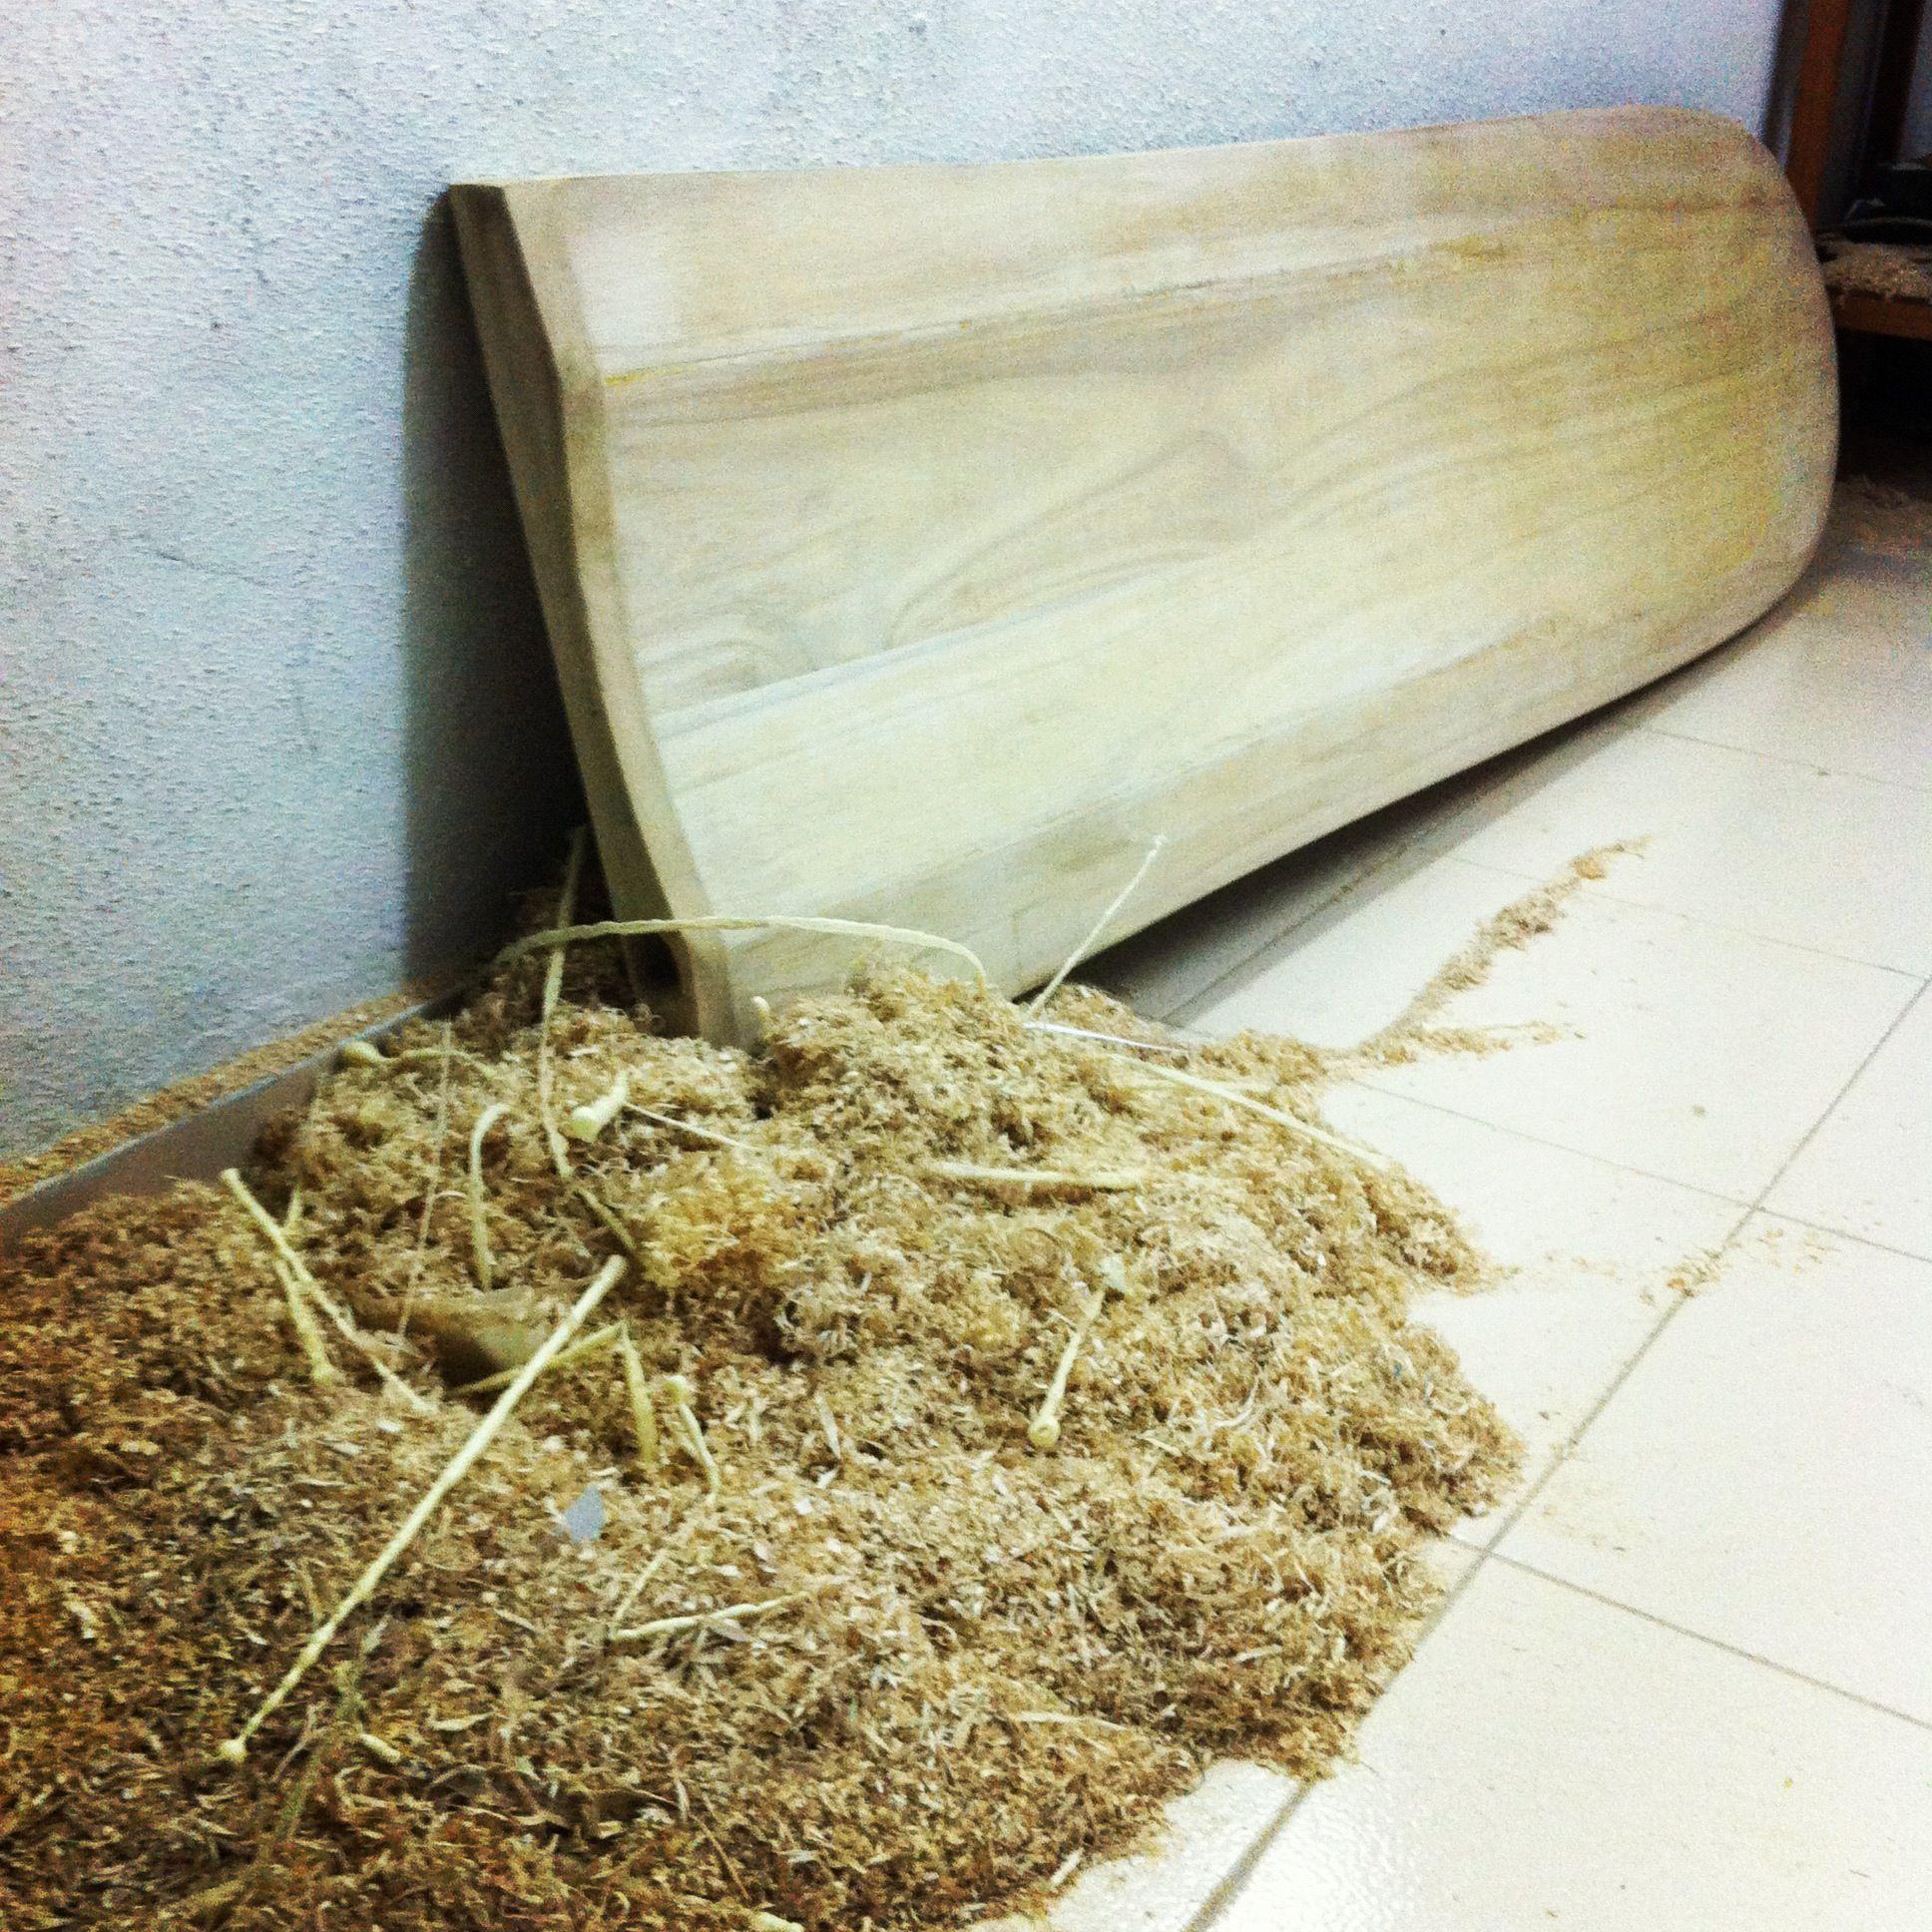 Hollow wooden alaia surfboard